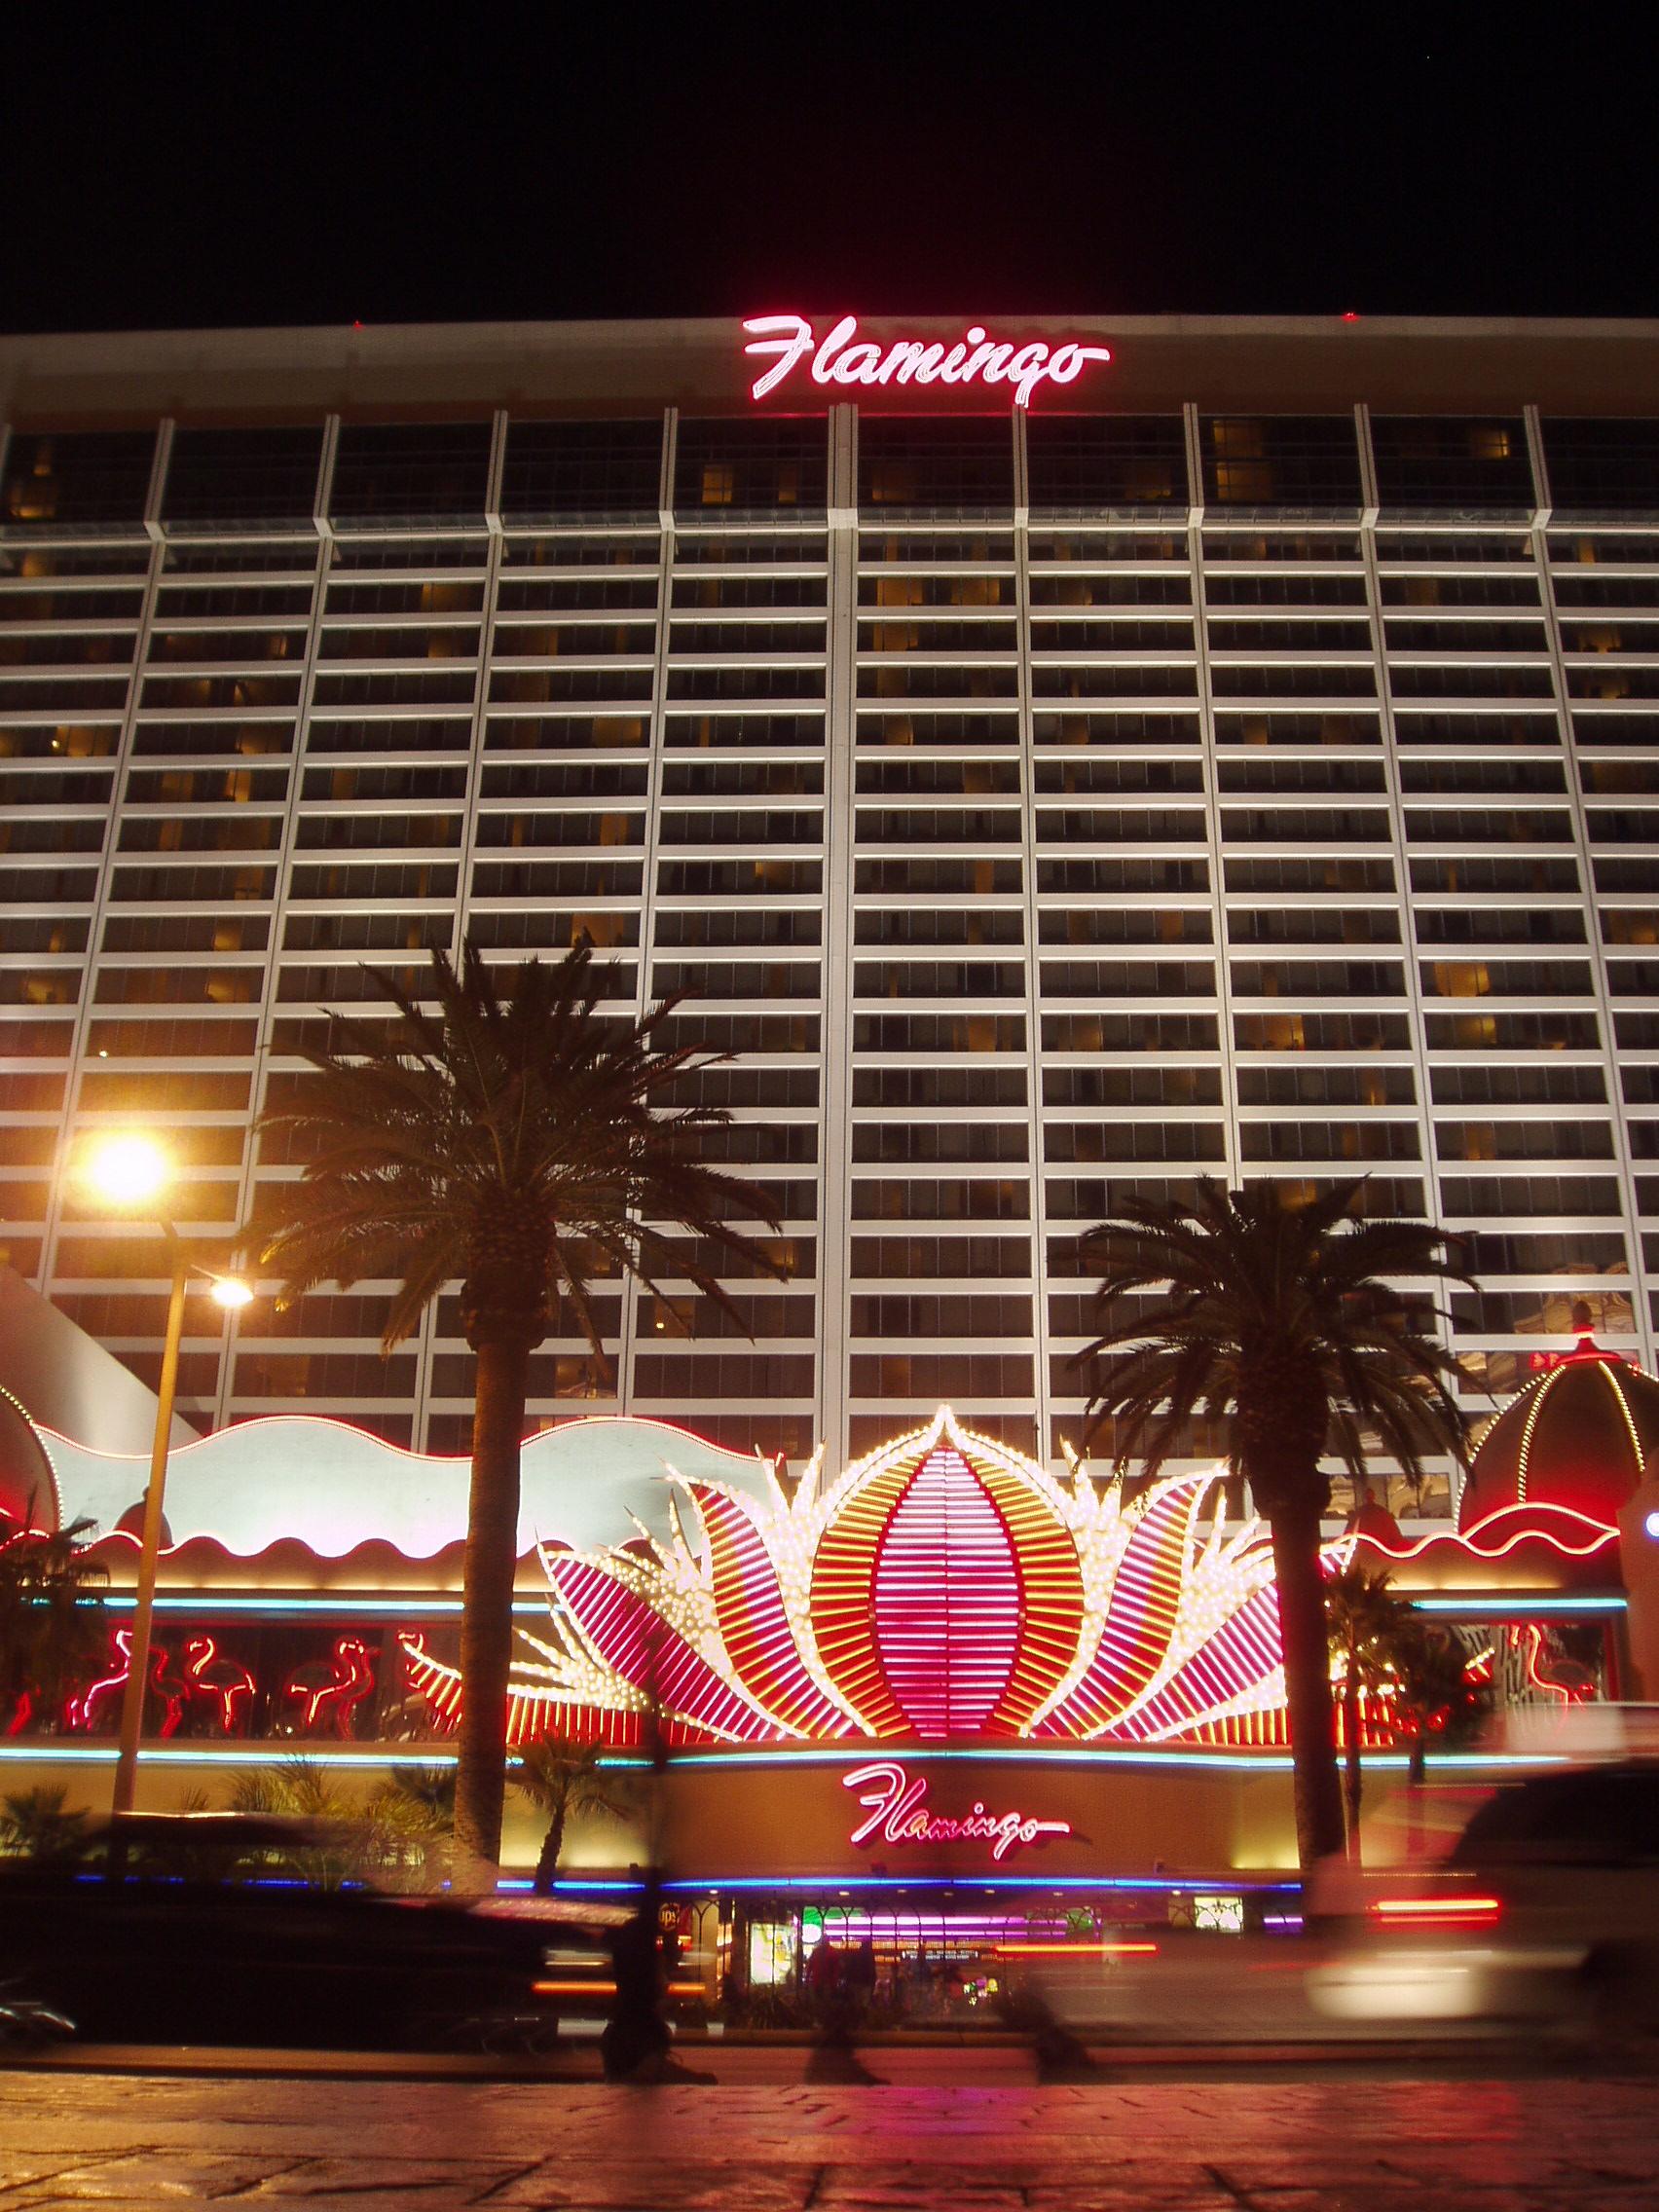 The Flamingo Hotel Las Vegas